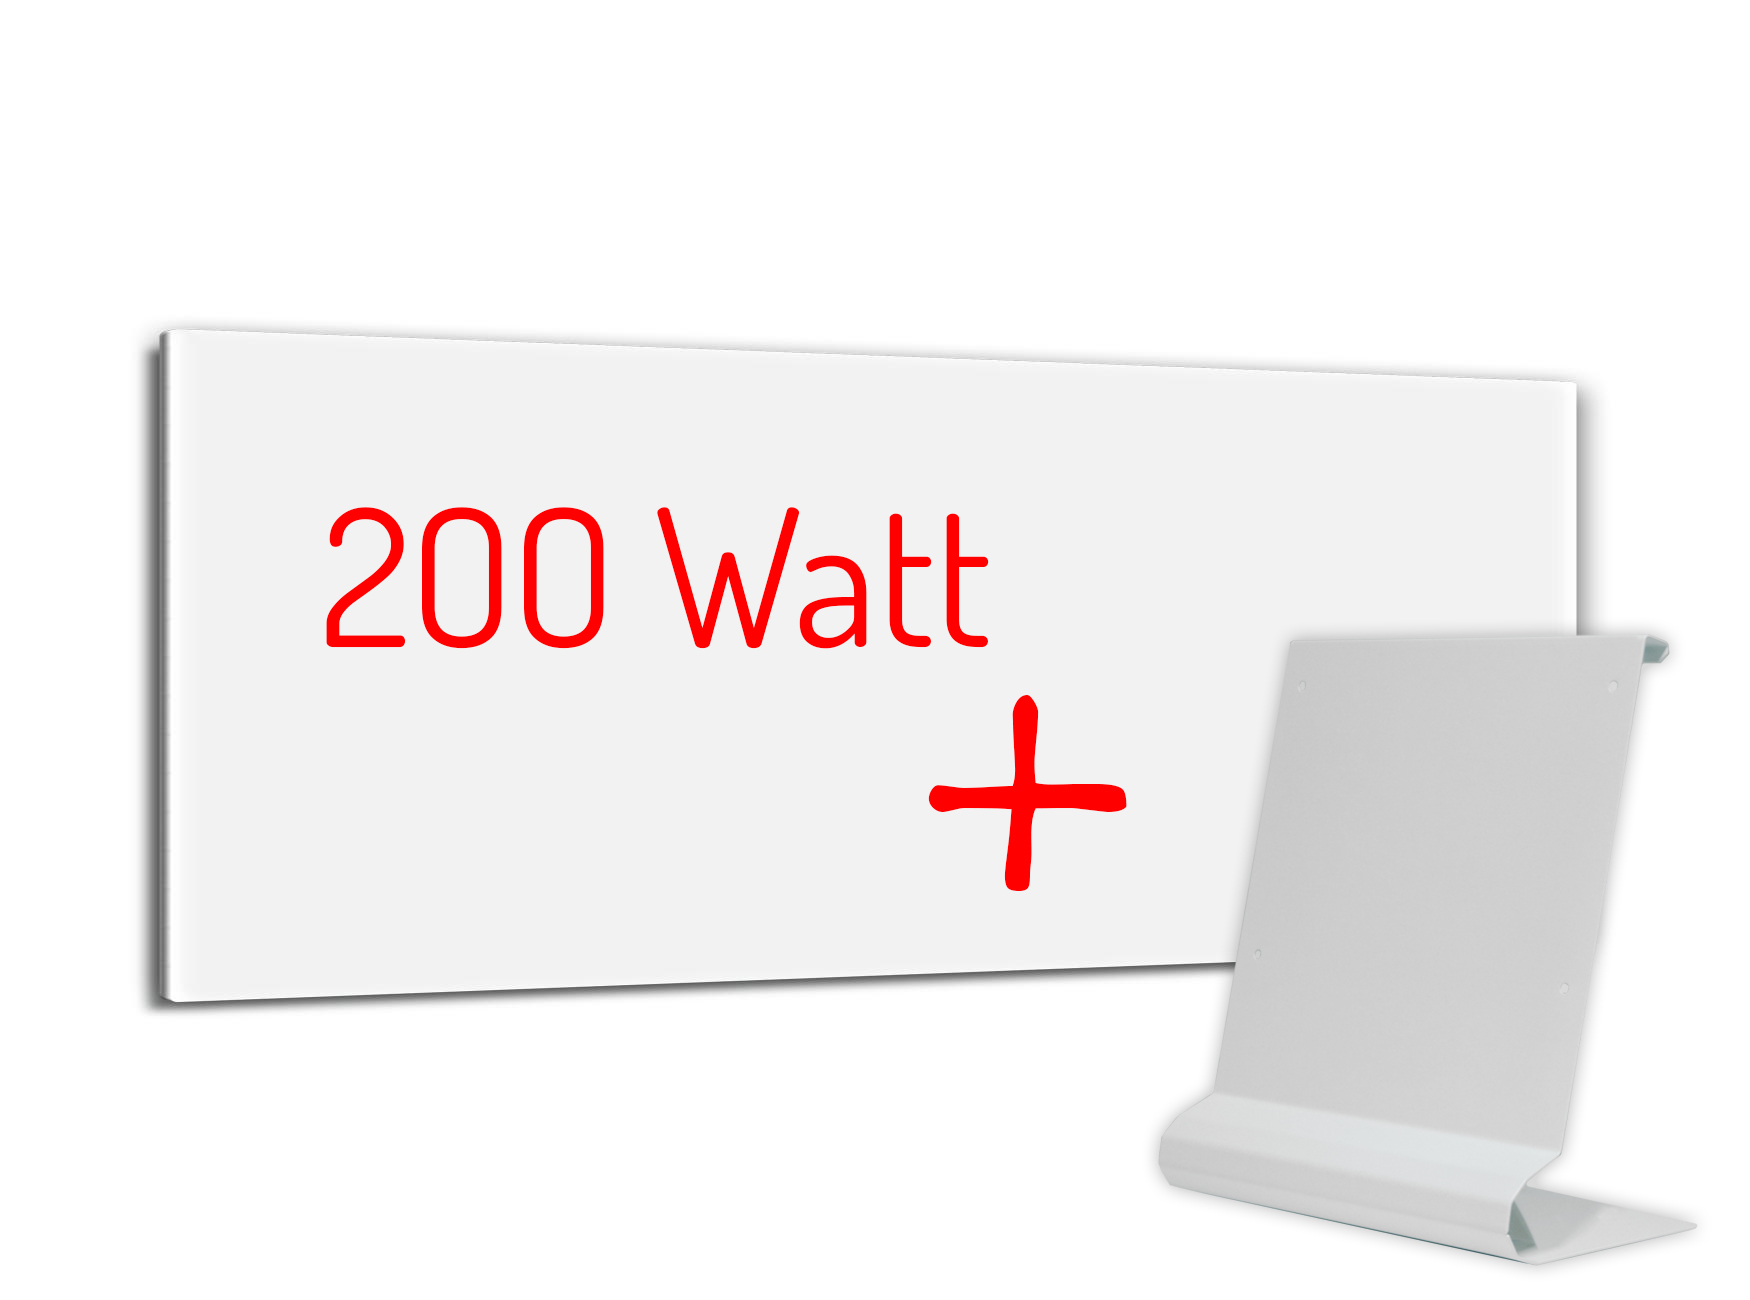 PowerSun Standheizung 200 Watt 24x60cm